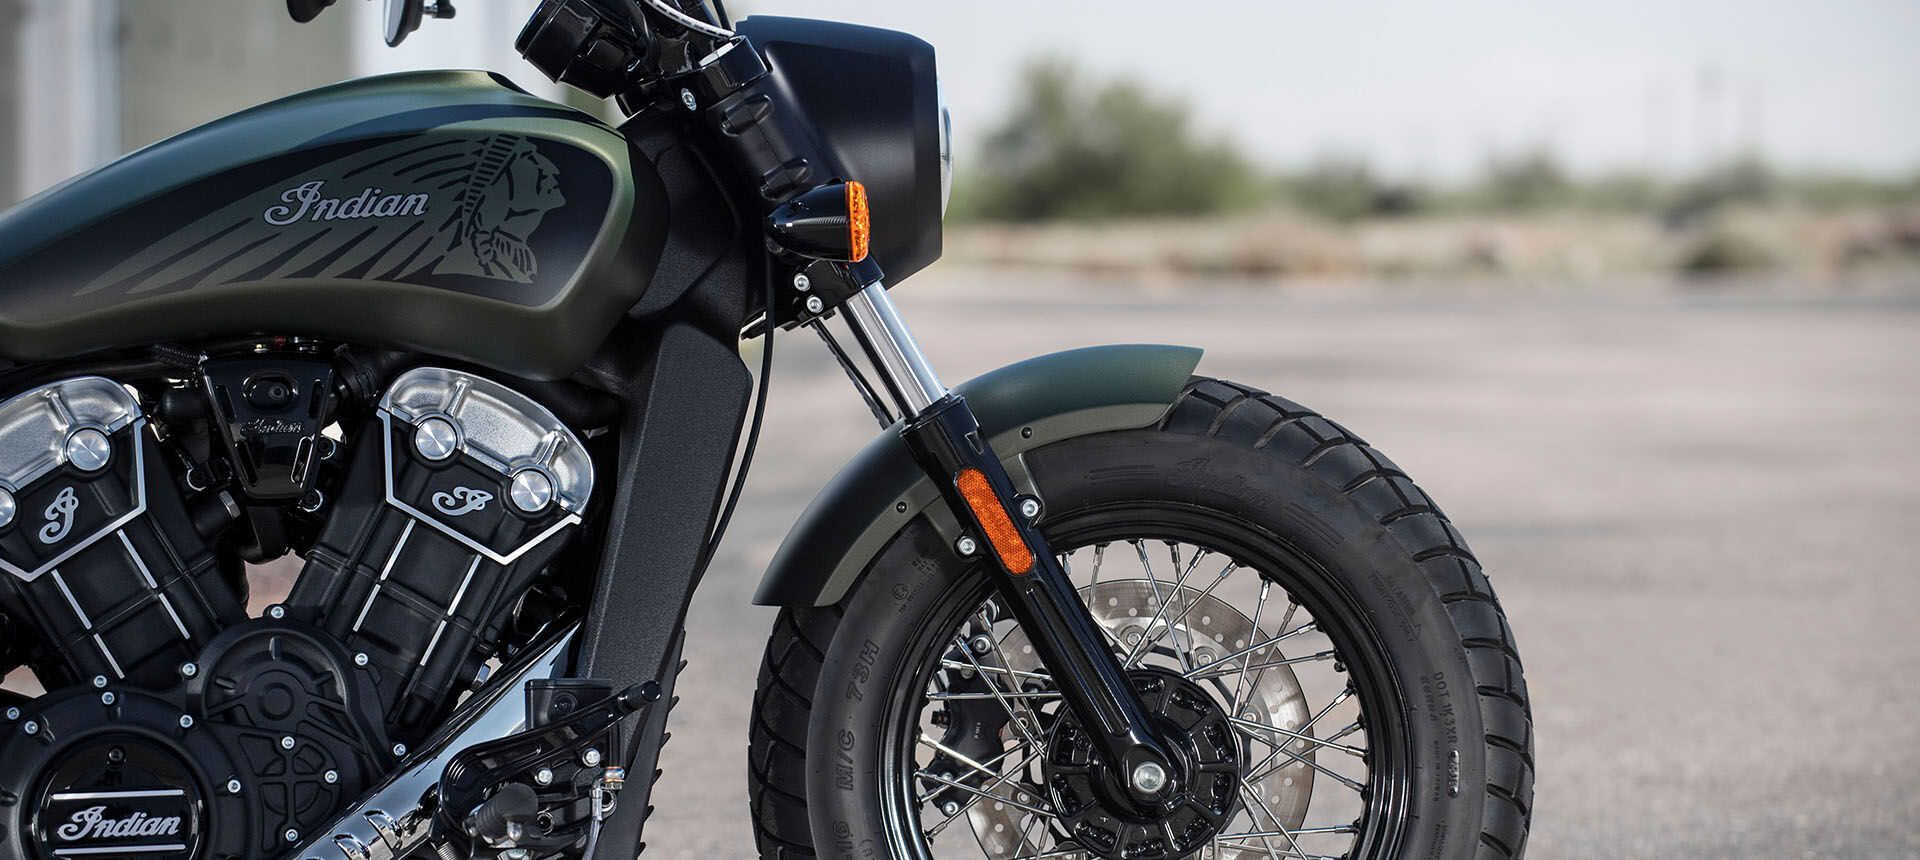 Мотоцикл Indian Scout Bobber Twenty Sagebrush Smoke 2020 - 5